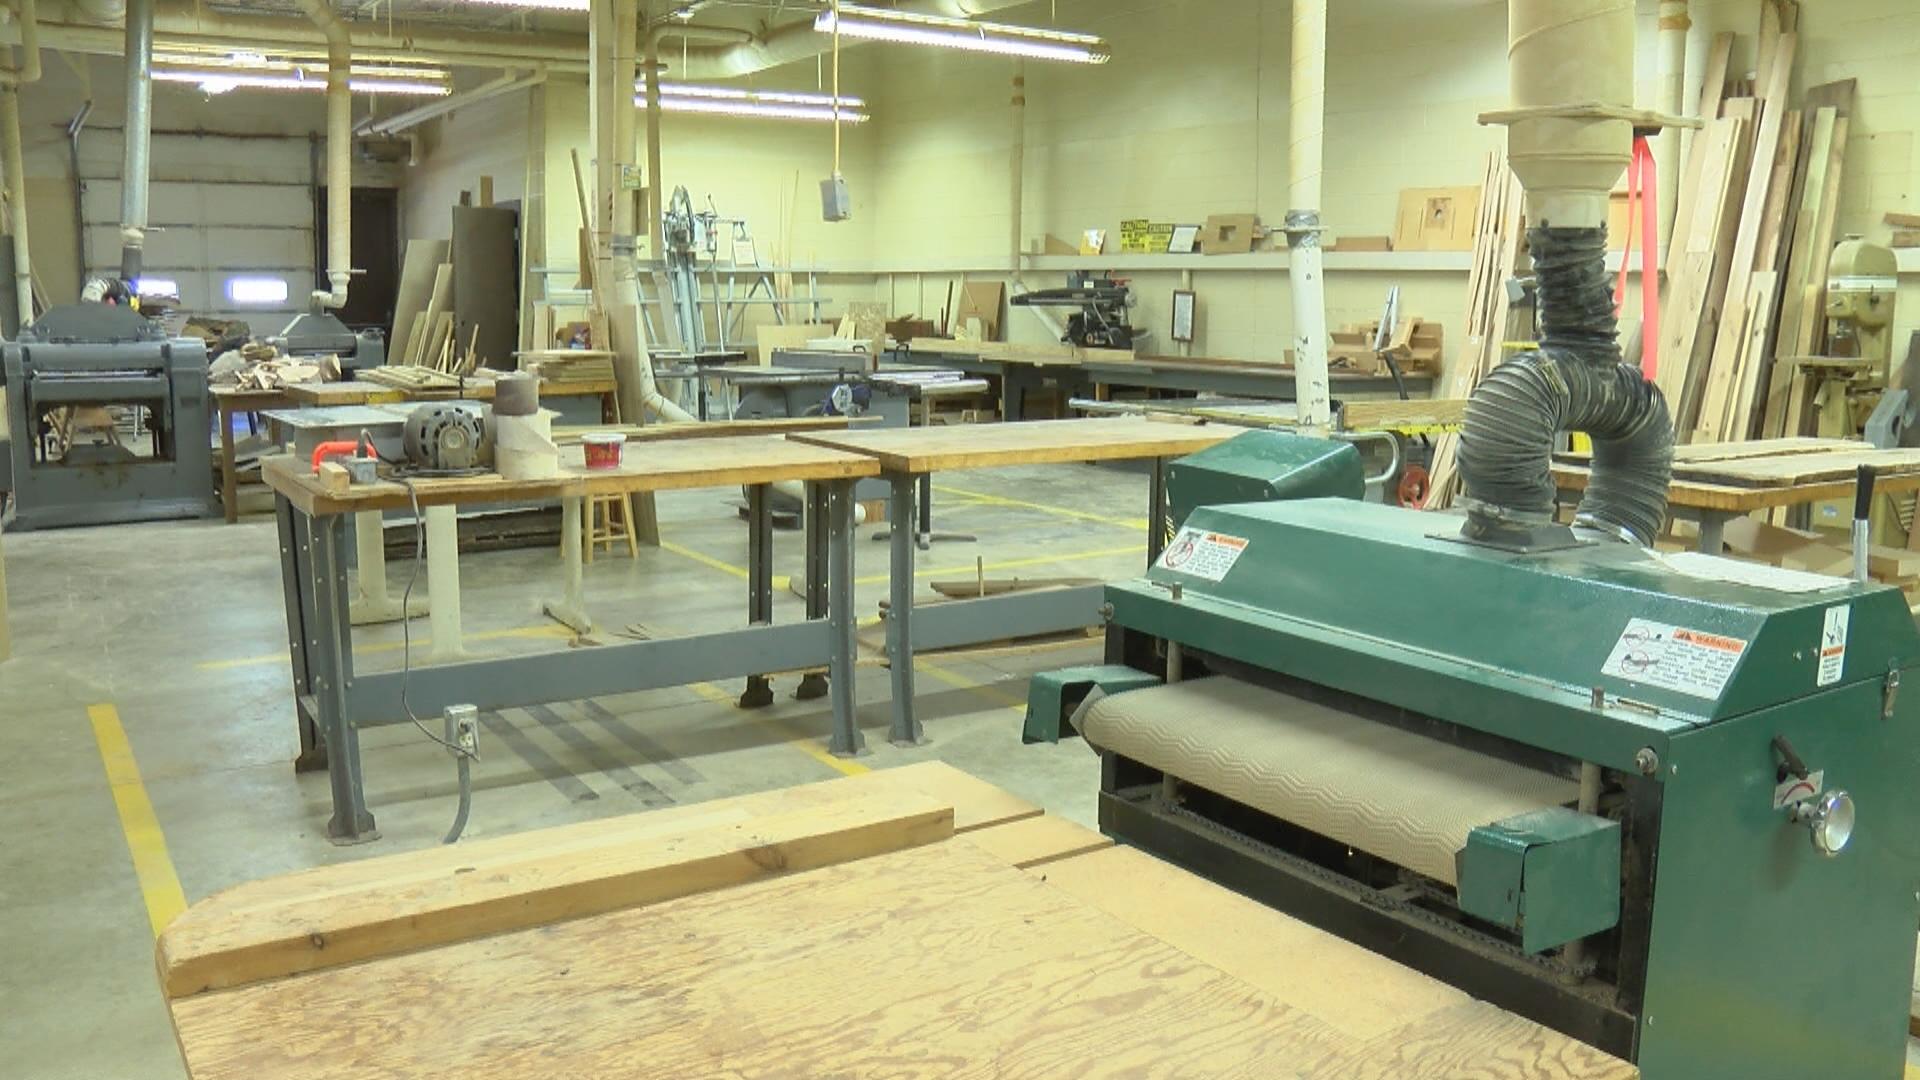 Woodworking Class To Teach Students New Skill Wcia Com